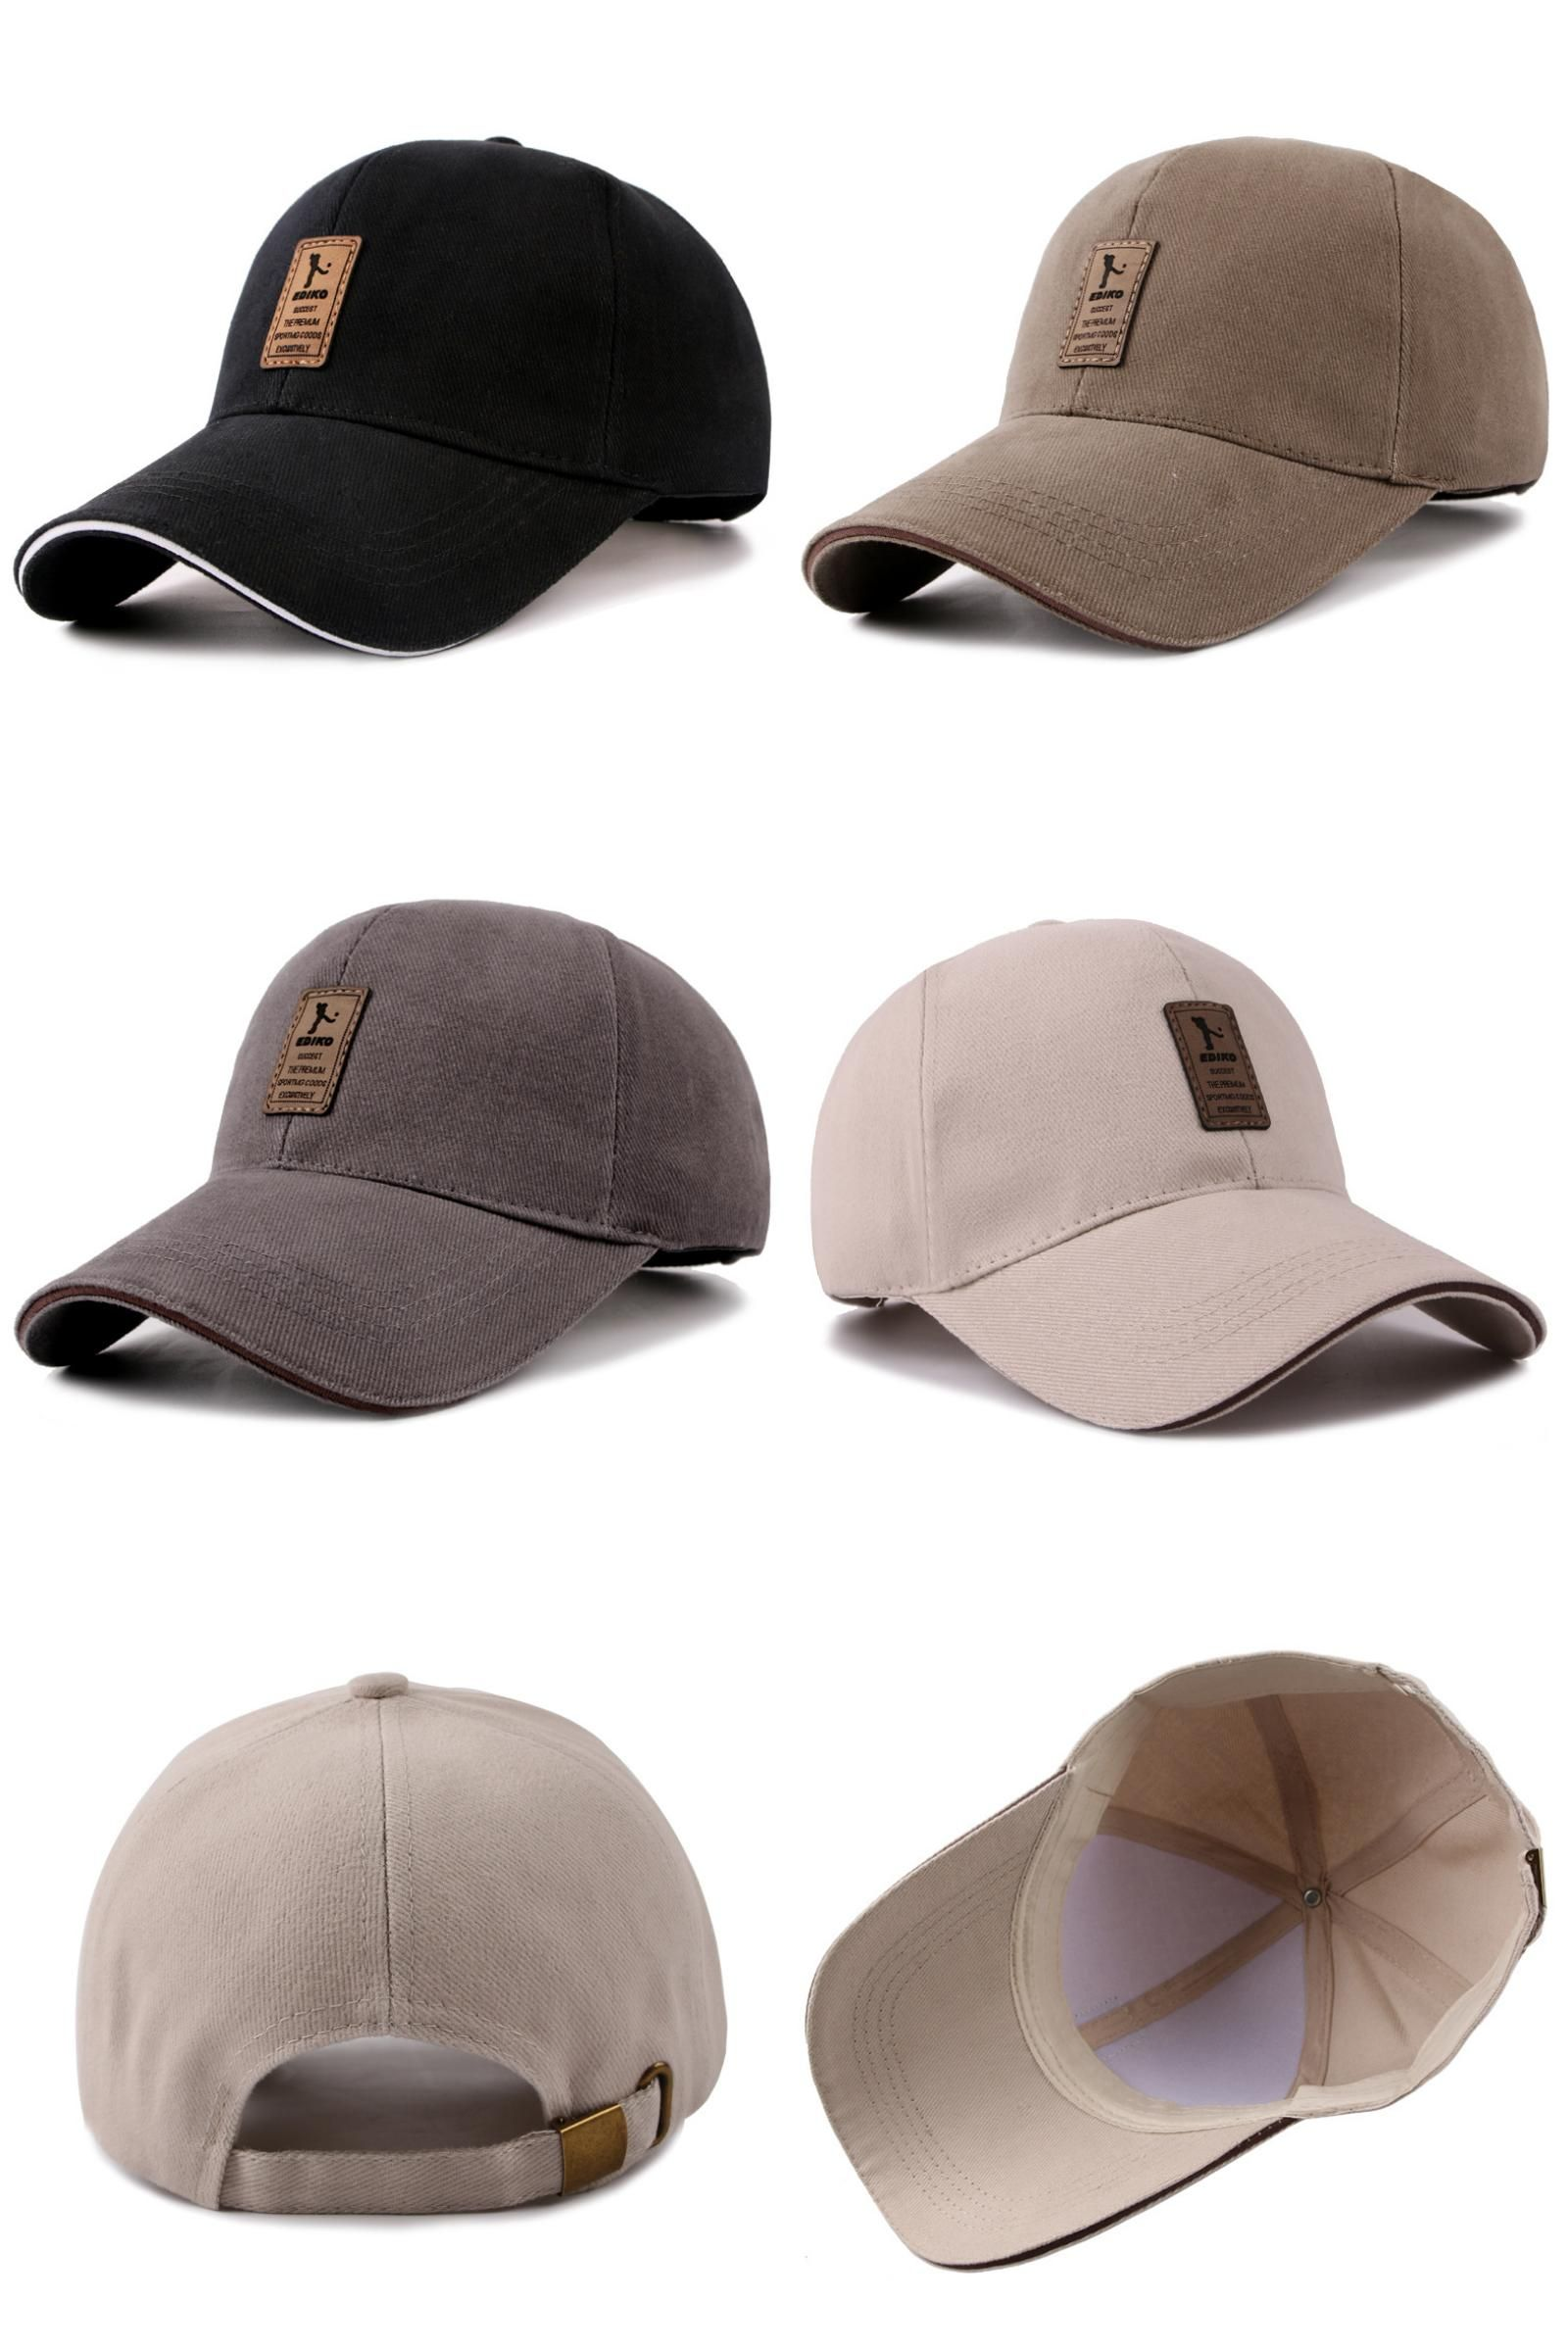 66b71ebb721  Visit to Buy  Branded Mens Womens Baseball Cap Snapback Polo Hat Boys Hip  Hop